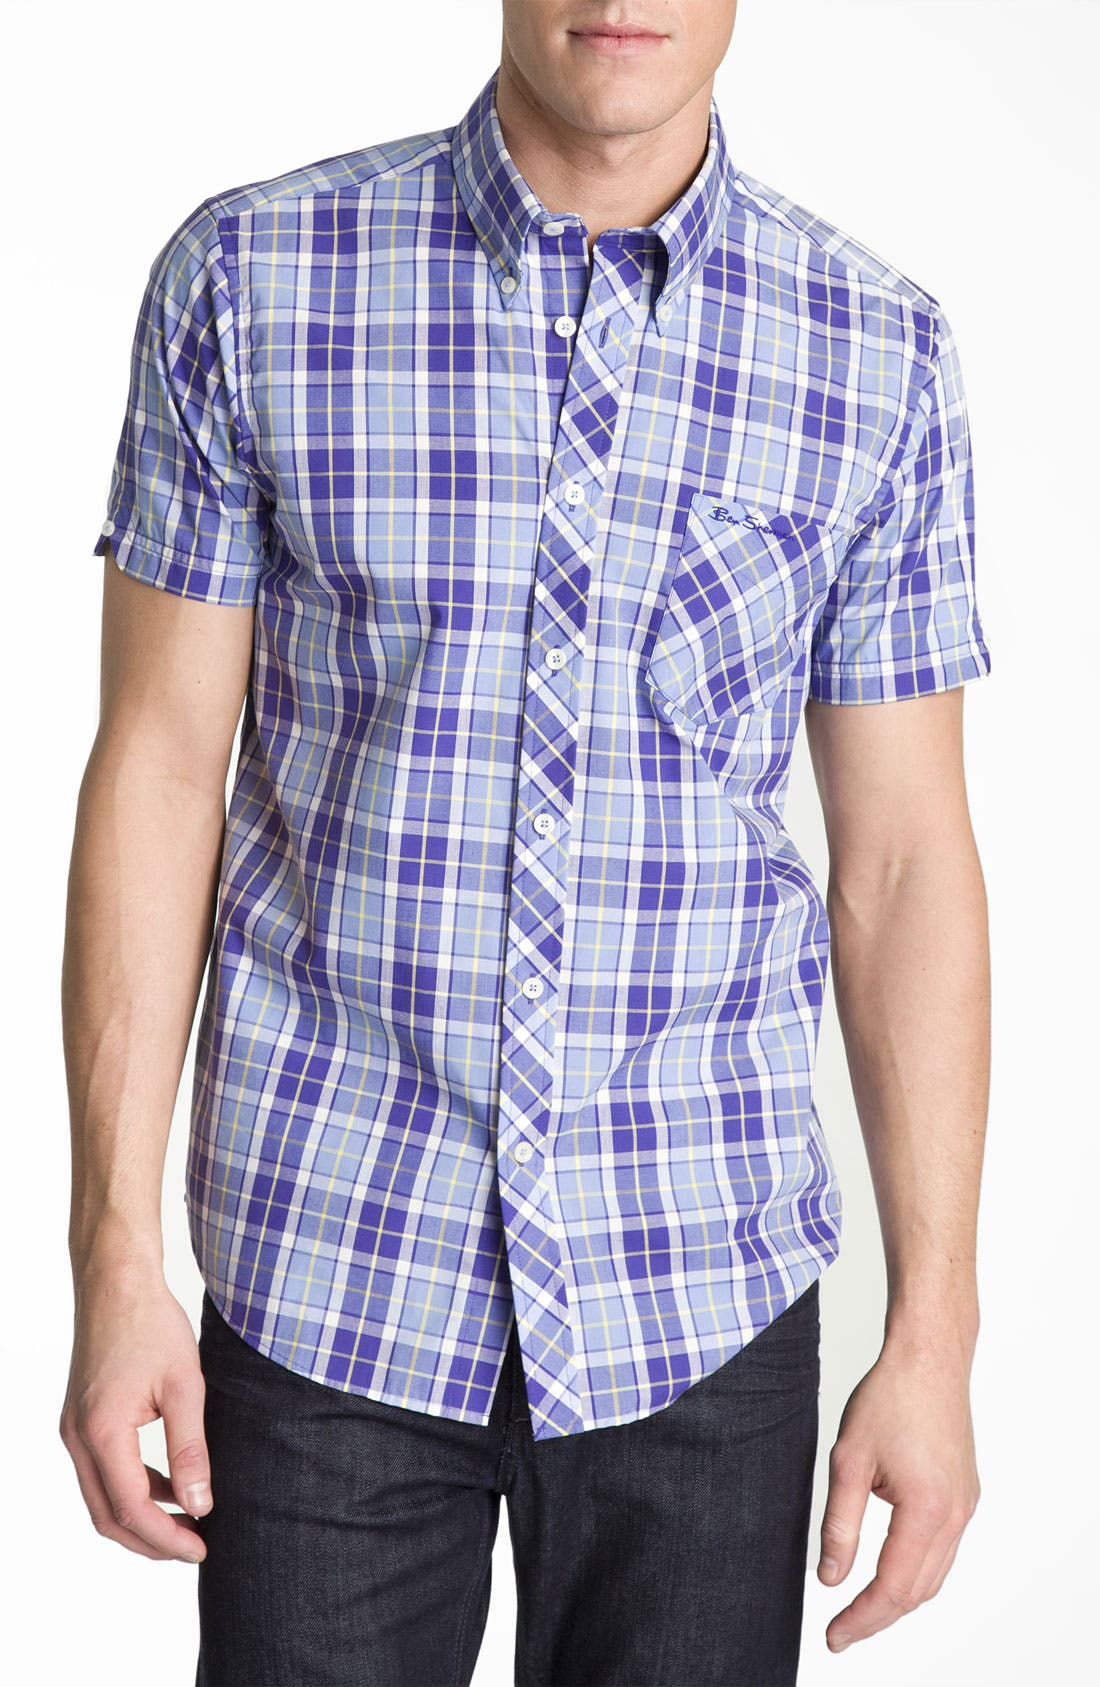 Alternate Image 1 Selected - Ben Sherman 'Covent' Plaid Woven Shirt